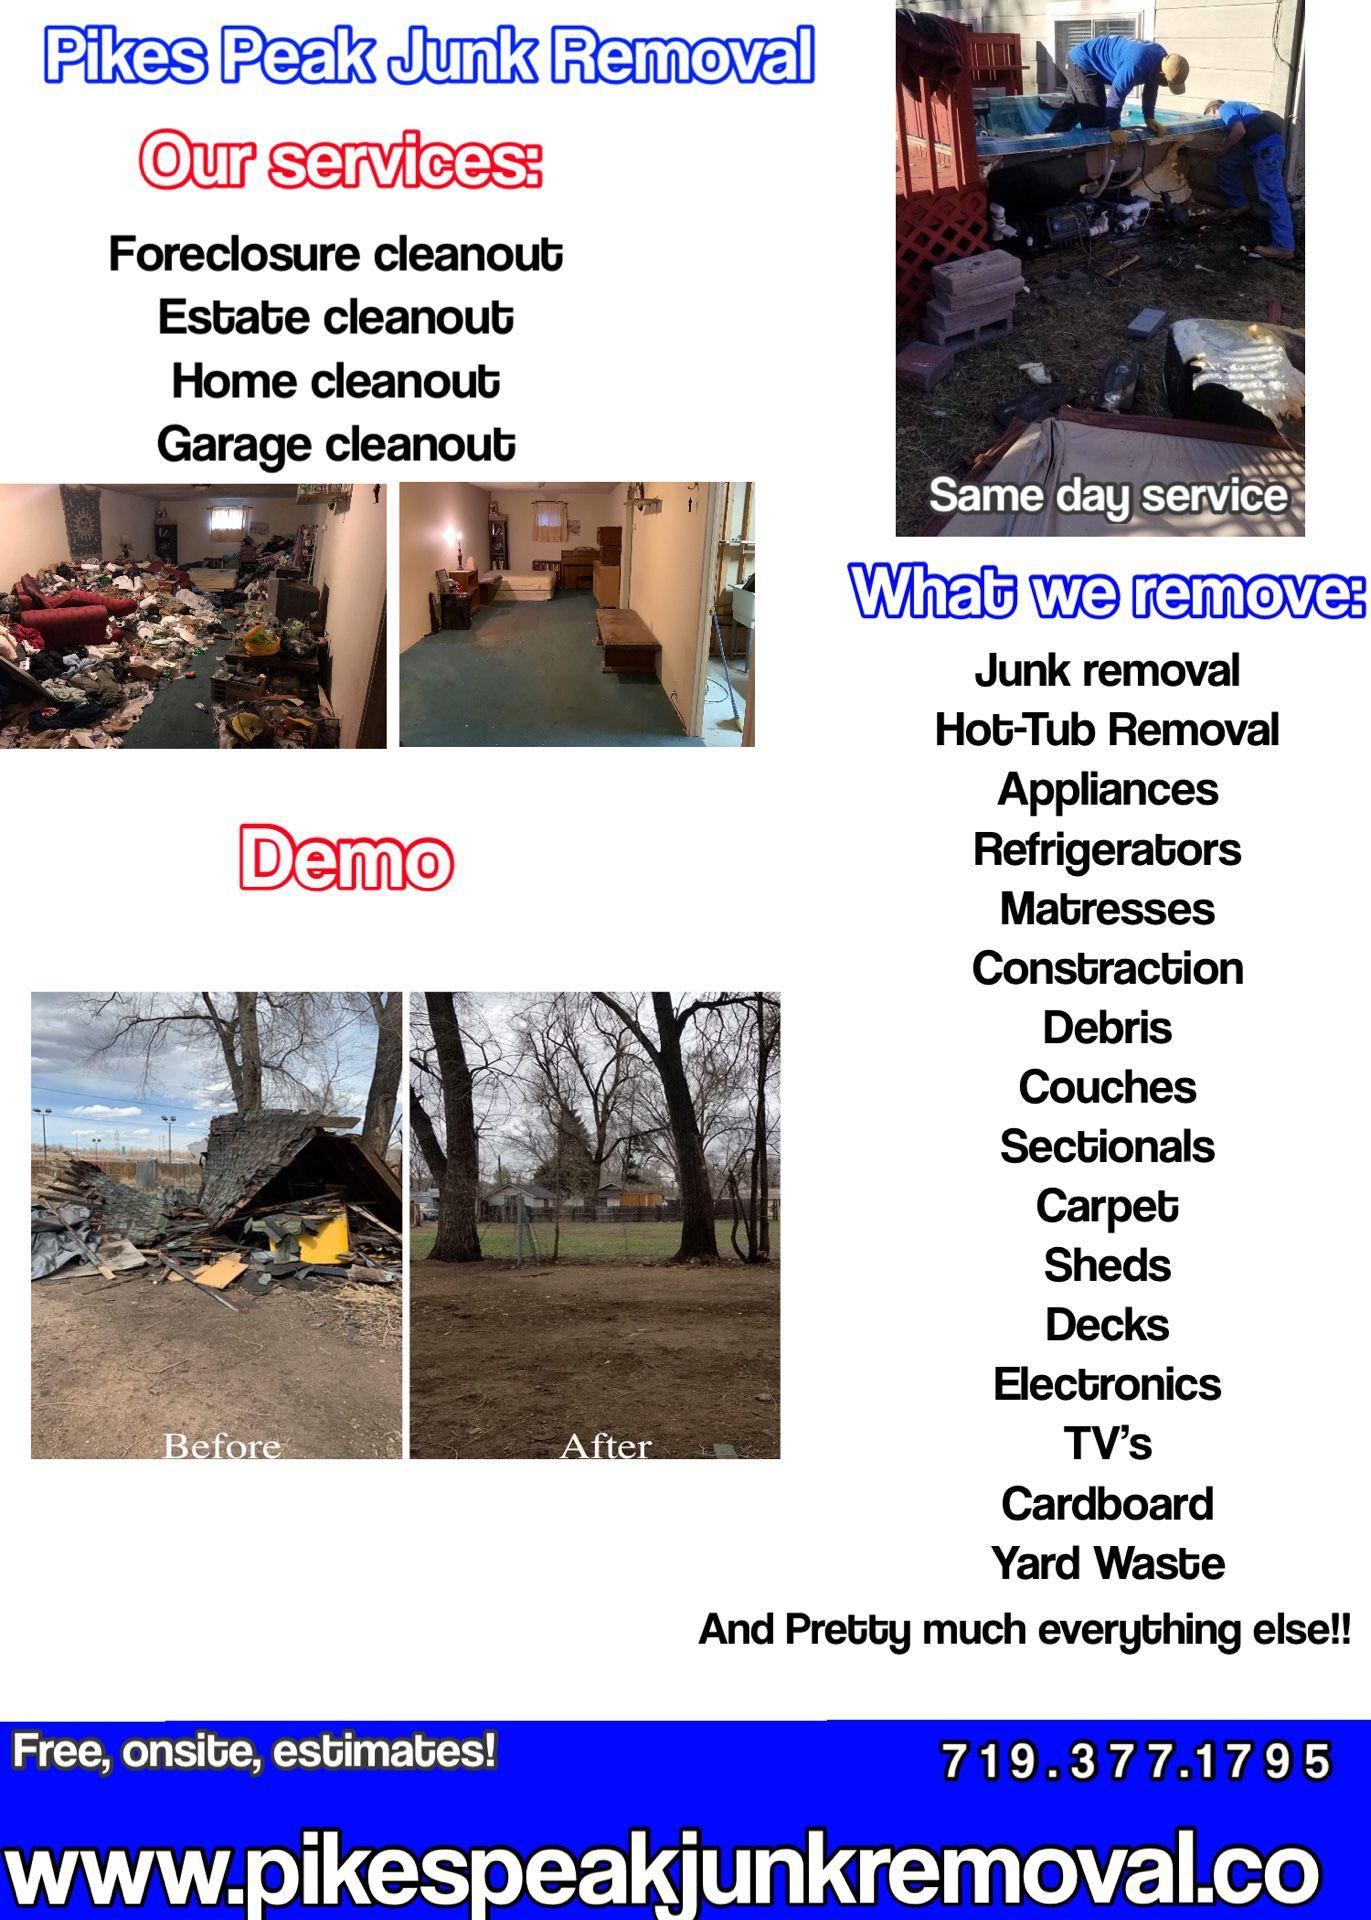 Junk/Trash/Hot-Tub/Deck/Shed Removal, Hauling & Demos